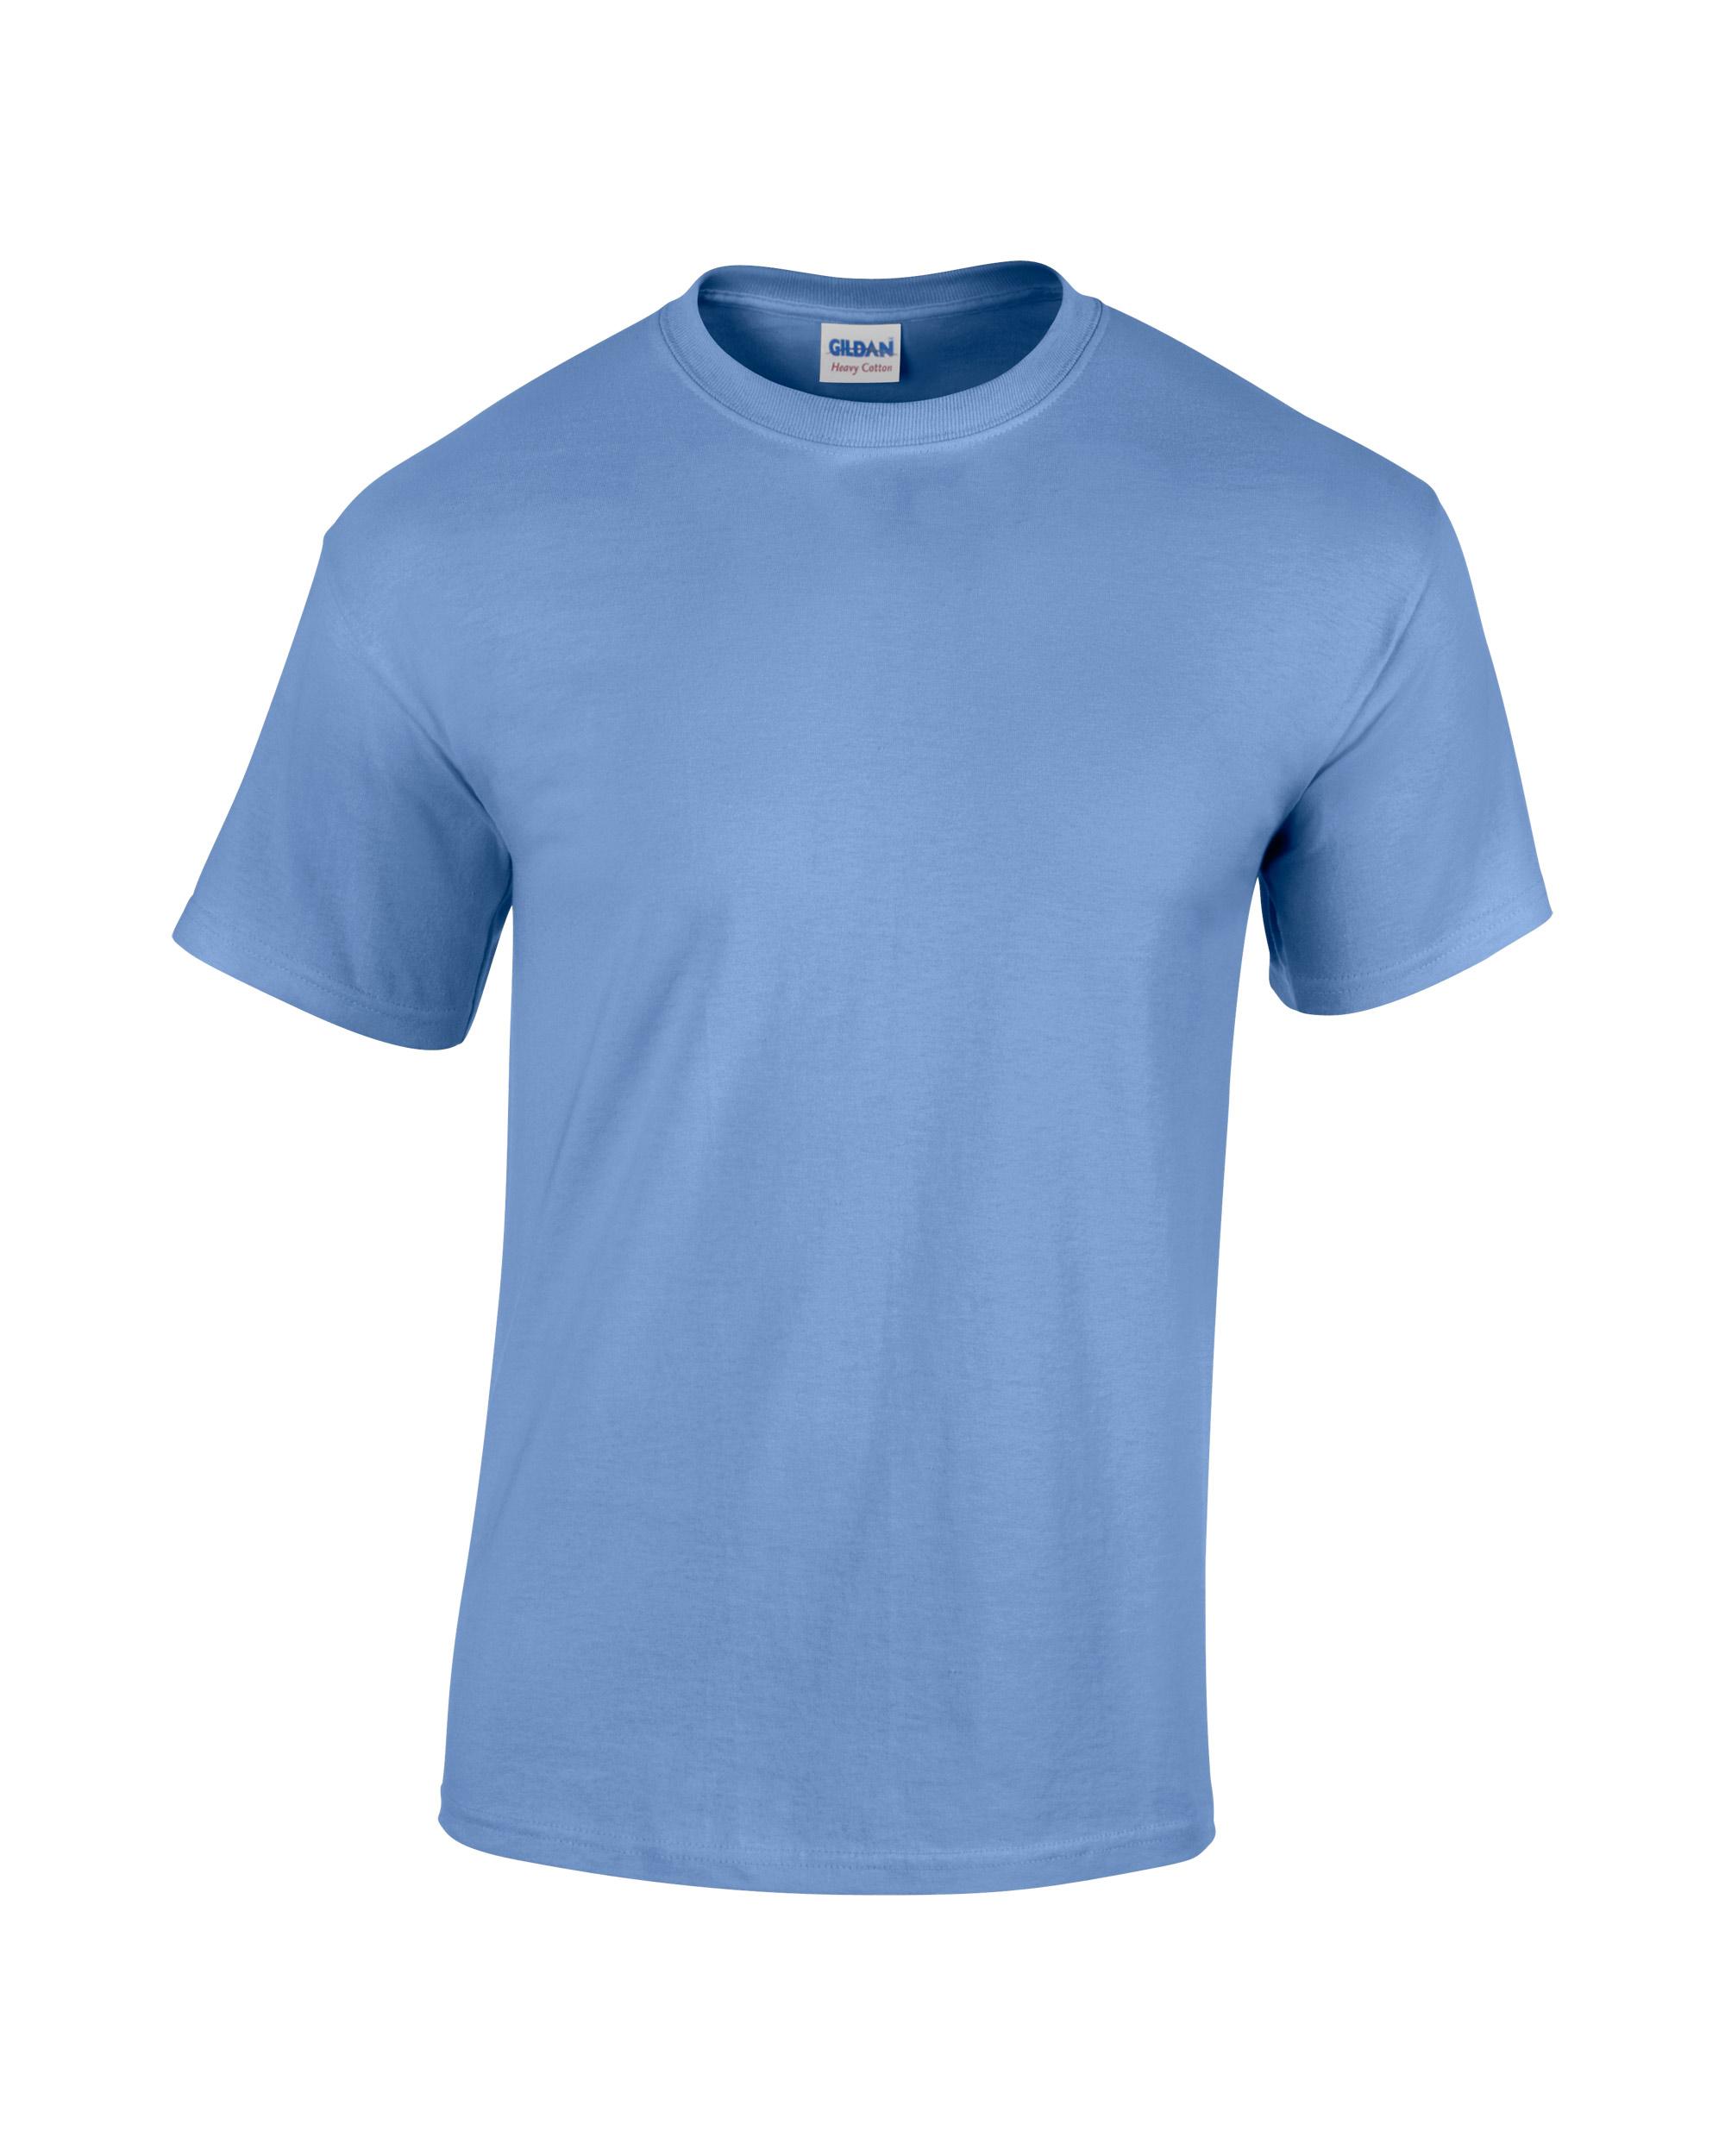 Shirt design blue cotton -  5000 659c_carolina Blue 5 3 Oz Heavy Cotton Mens Shirts Ladies Shirts